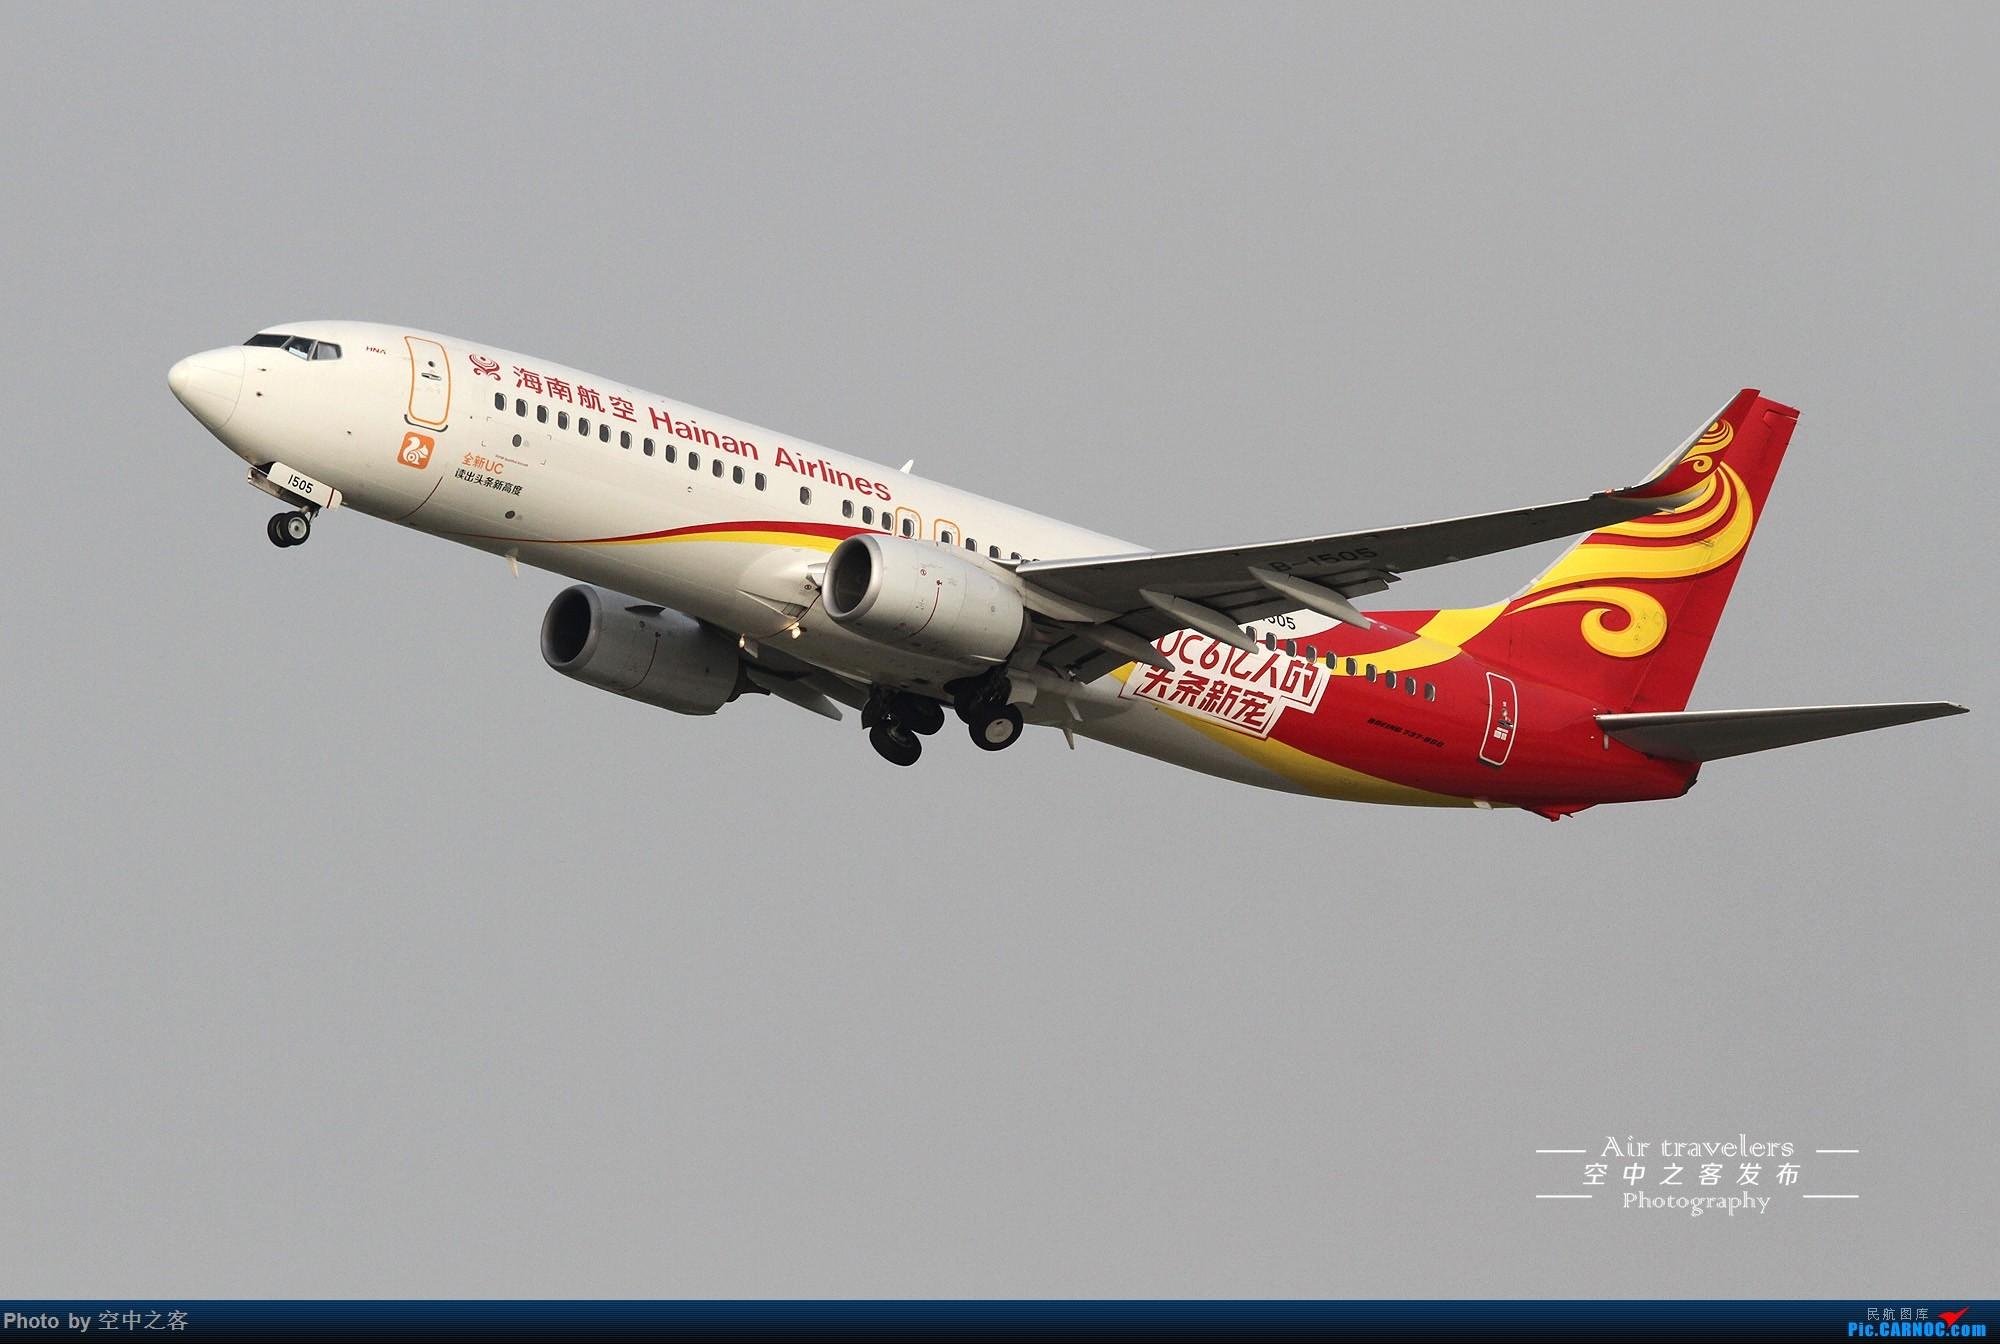 Re:[原创][合肥飞友会-霸都打机队 空中之客发布]解锁两只HU家的小彩绘+首航蓝鼻头~ BOEING 737-800 B-1505 合肥新桥国际机场